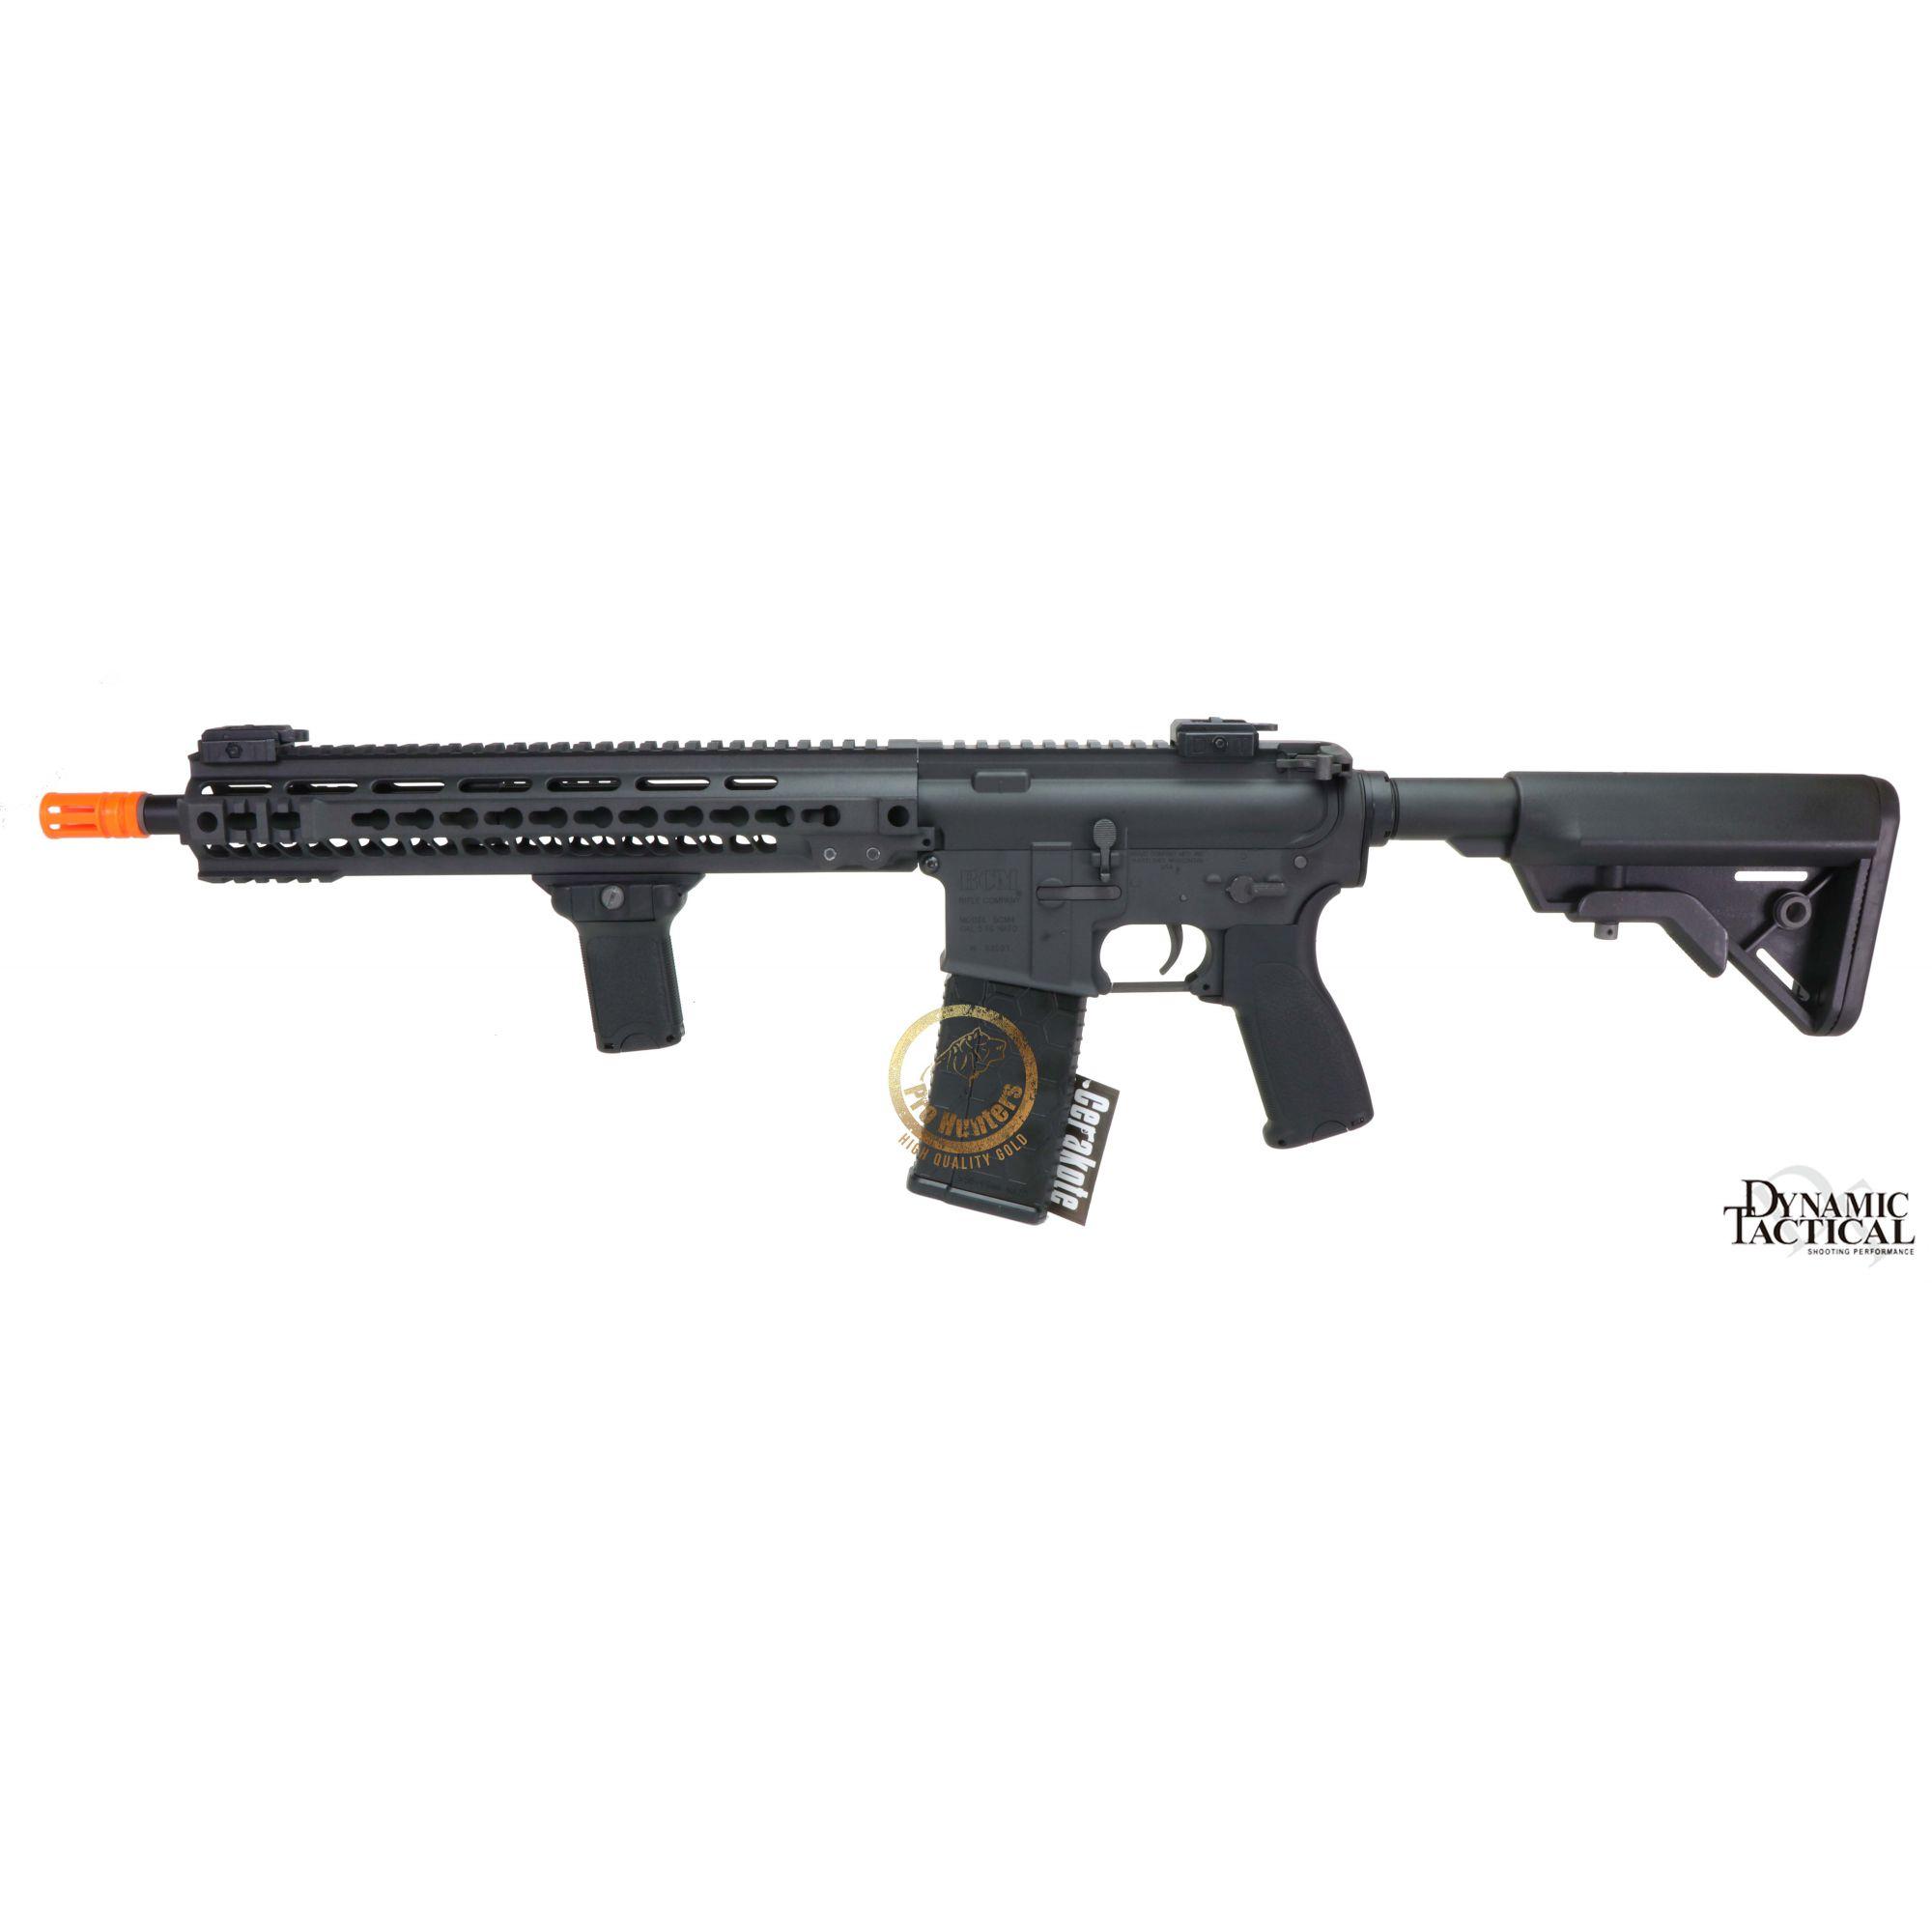 Rifle Airsoft Dytac MK4 SMR 14.5 Polegadas - Black